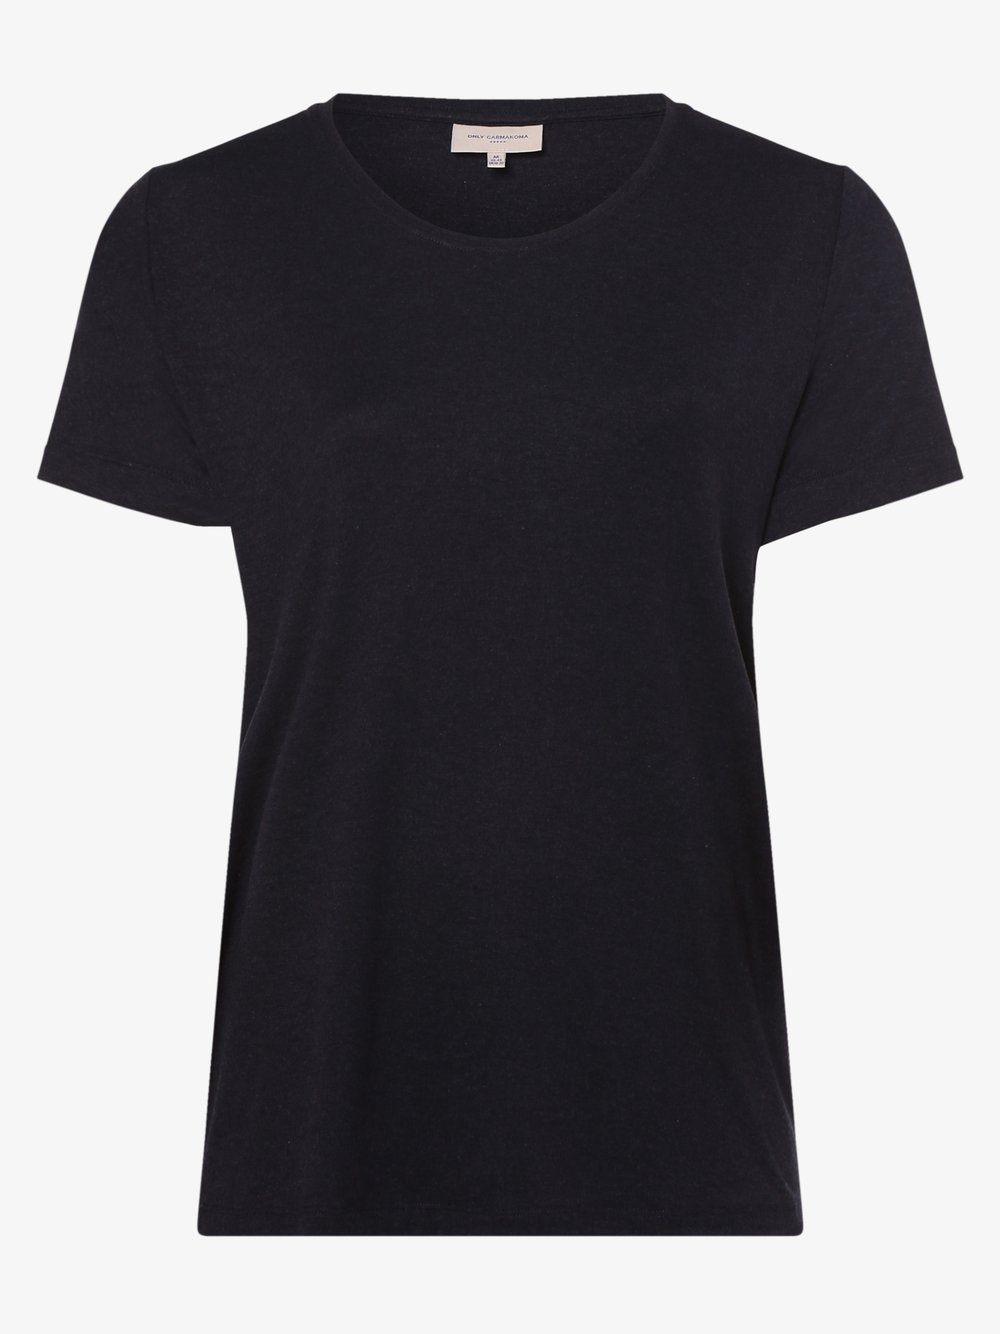 ONLY Carmakoma – T-shirt damski – Carcarmakoma, niebieski Van Graaf 476893-0002-00540